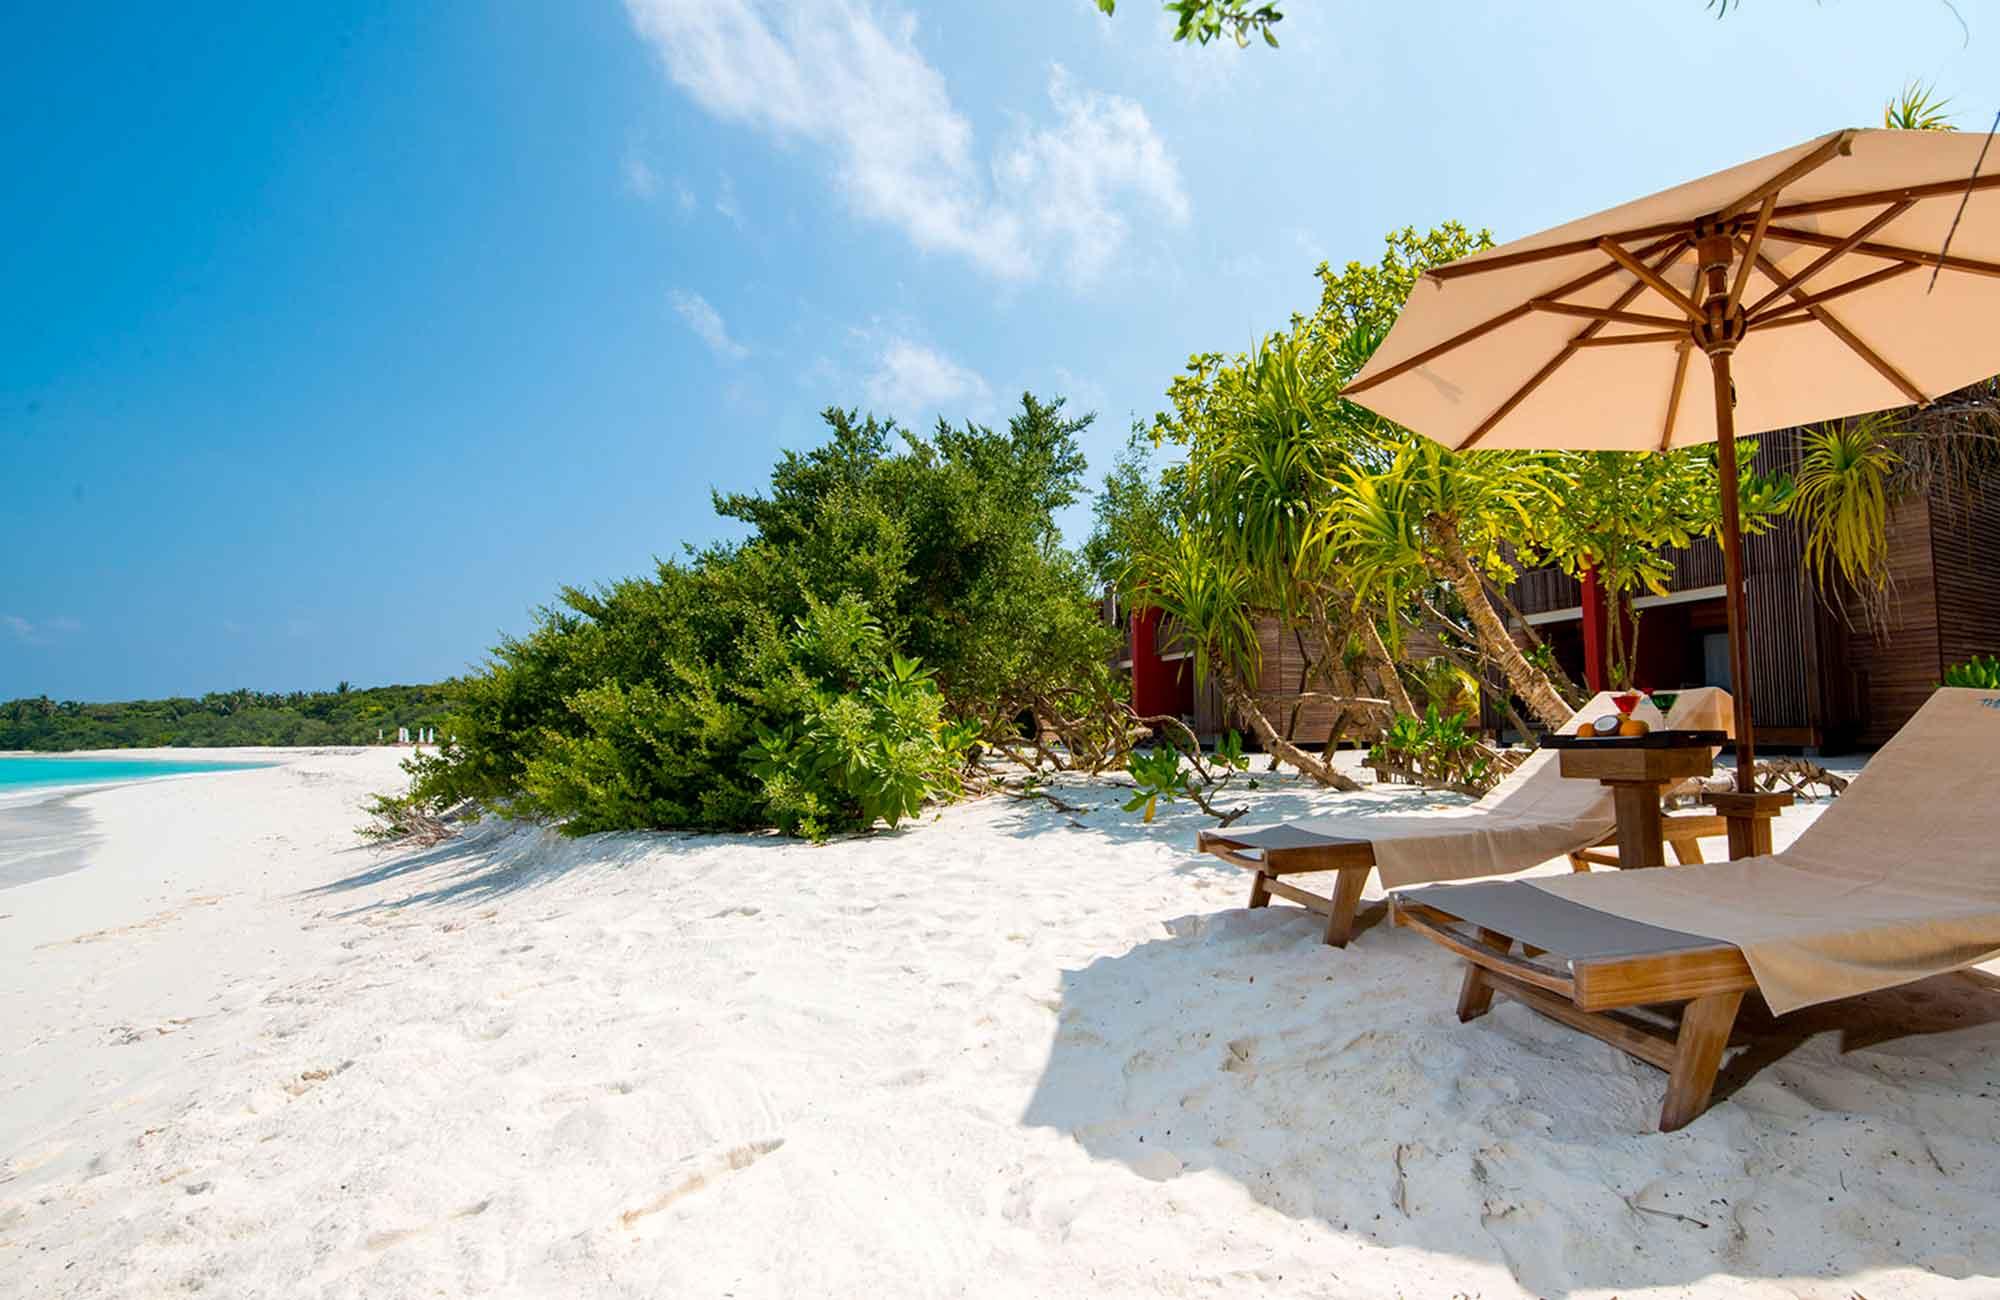 Séjour Maldives - Barefoot Eco Hotel - Amplitudes